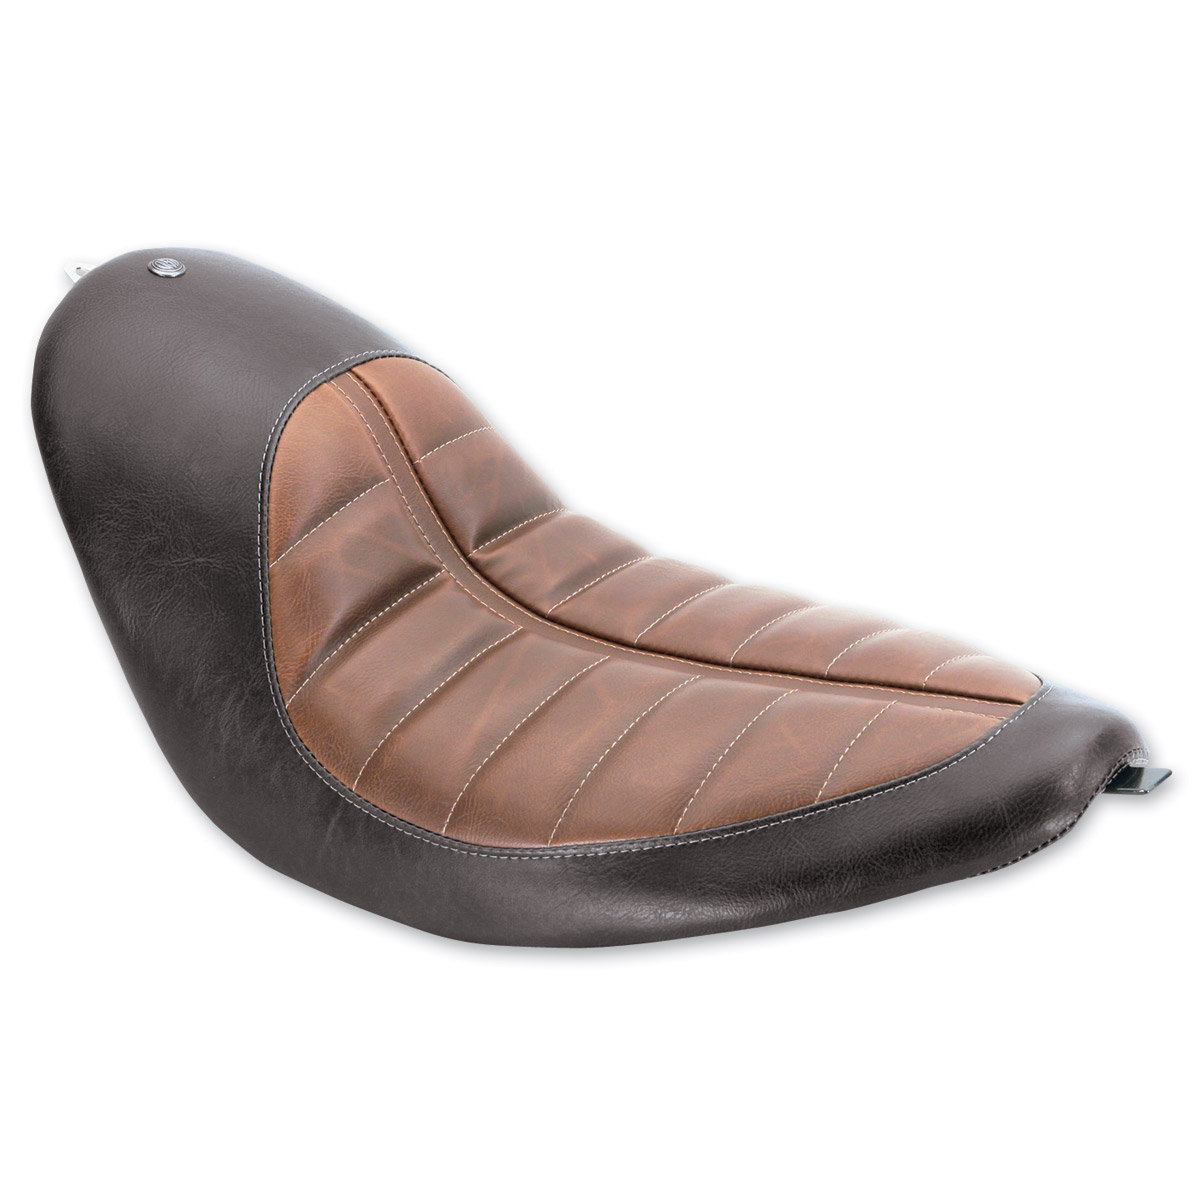 Roland Sands Design 200mm Tracker Fender Brown Enzo Solo Seat